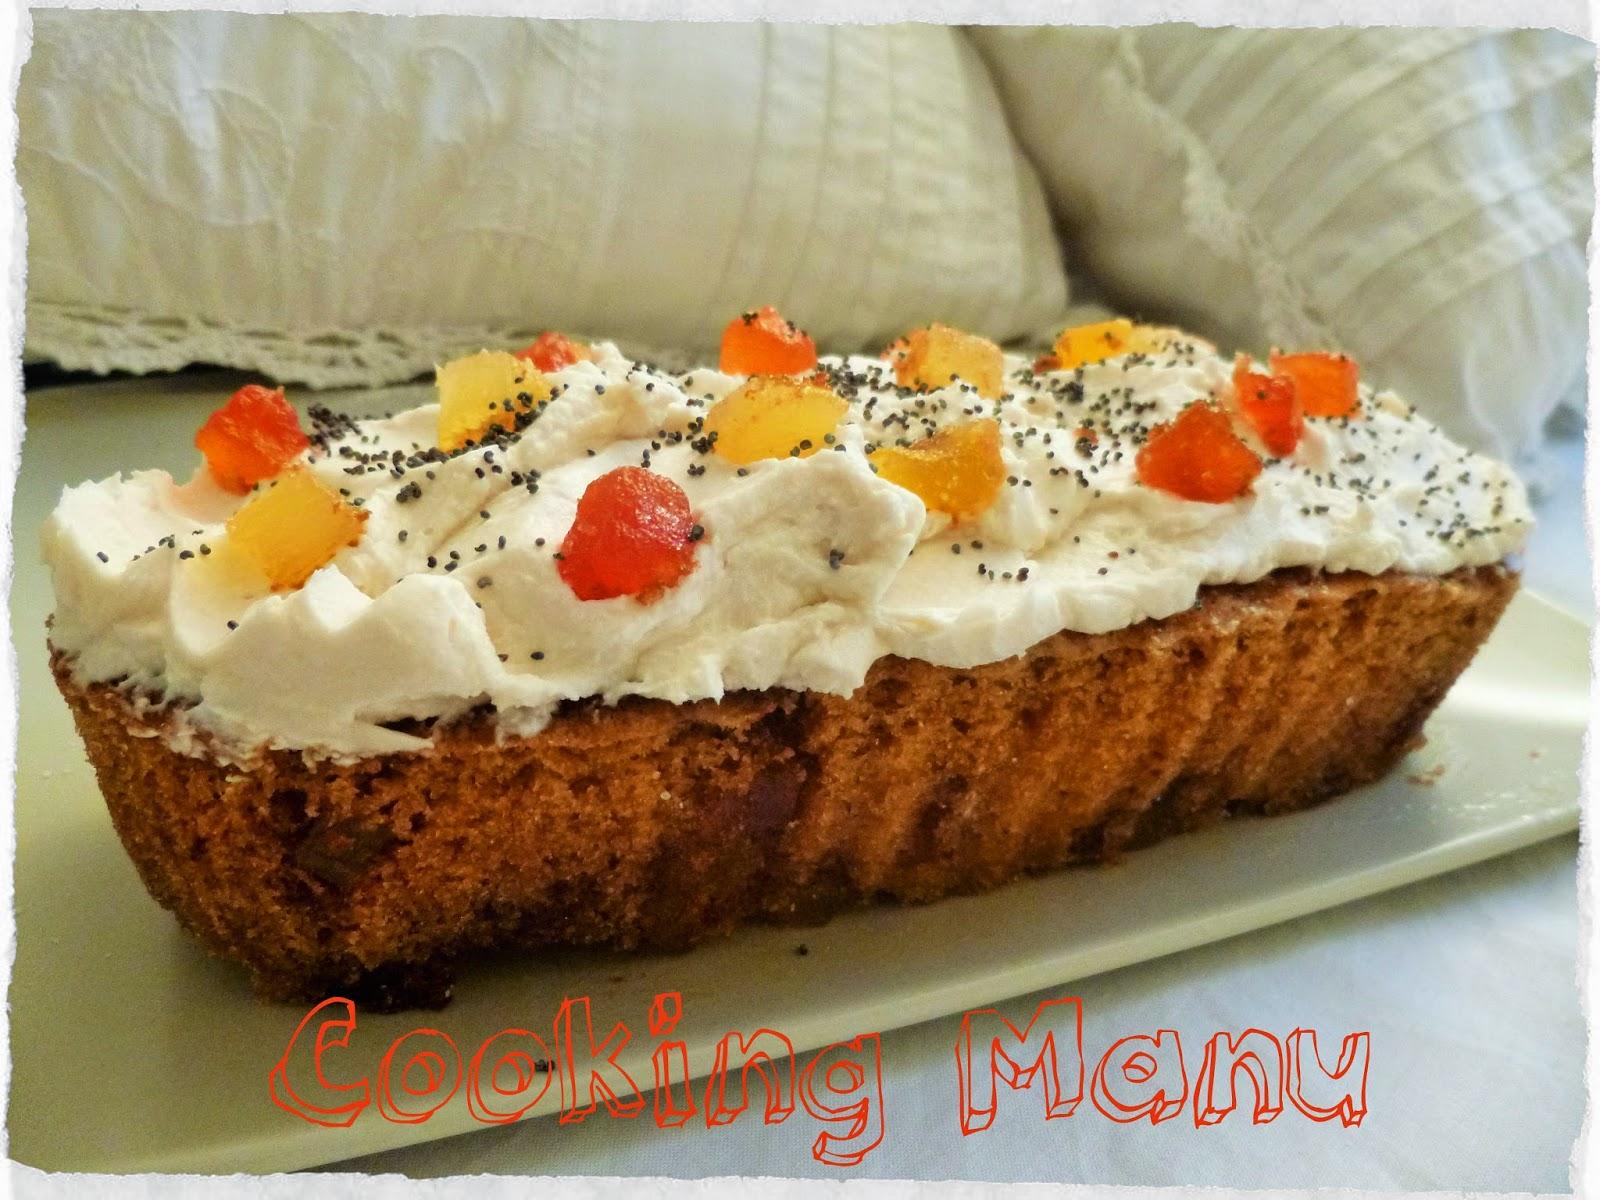 torta al limone con frosting al mascarpone (lemon loaf with mascarpone frosting)